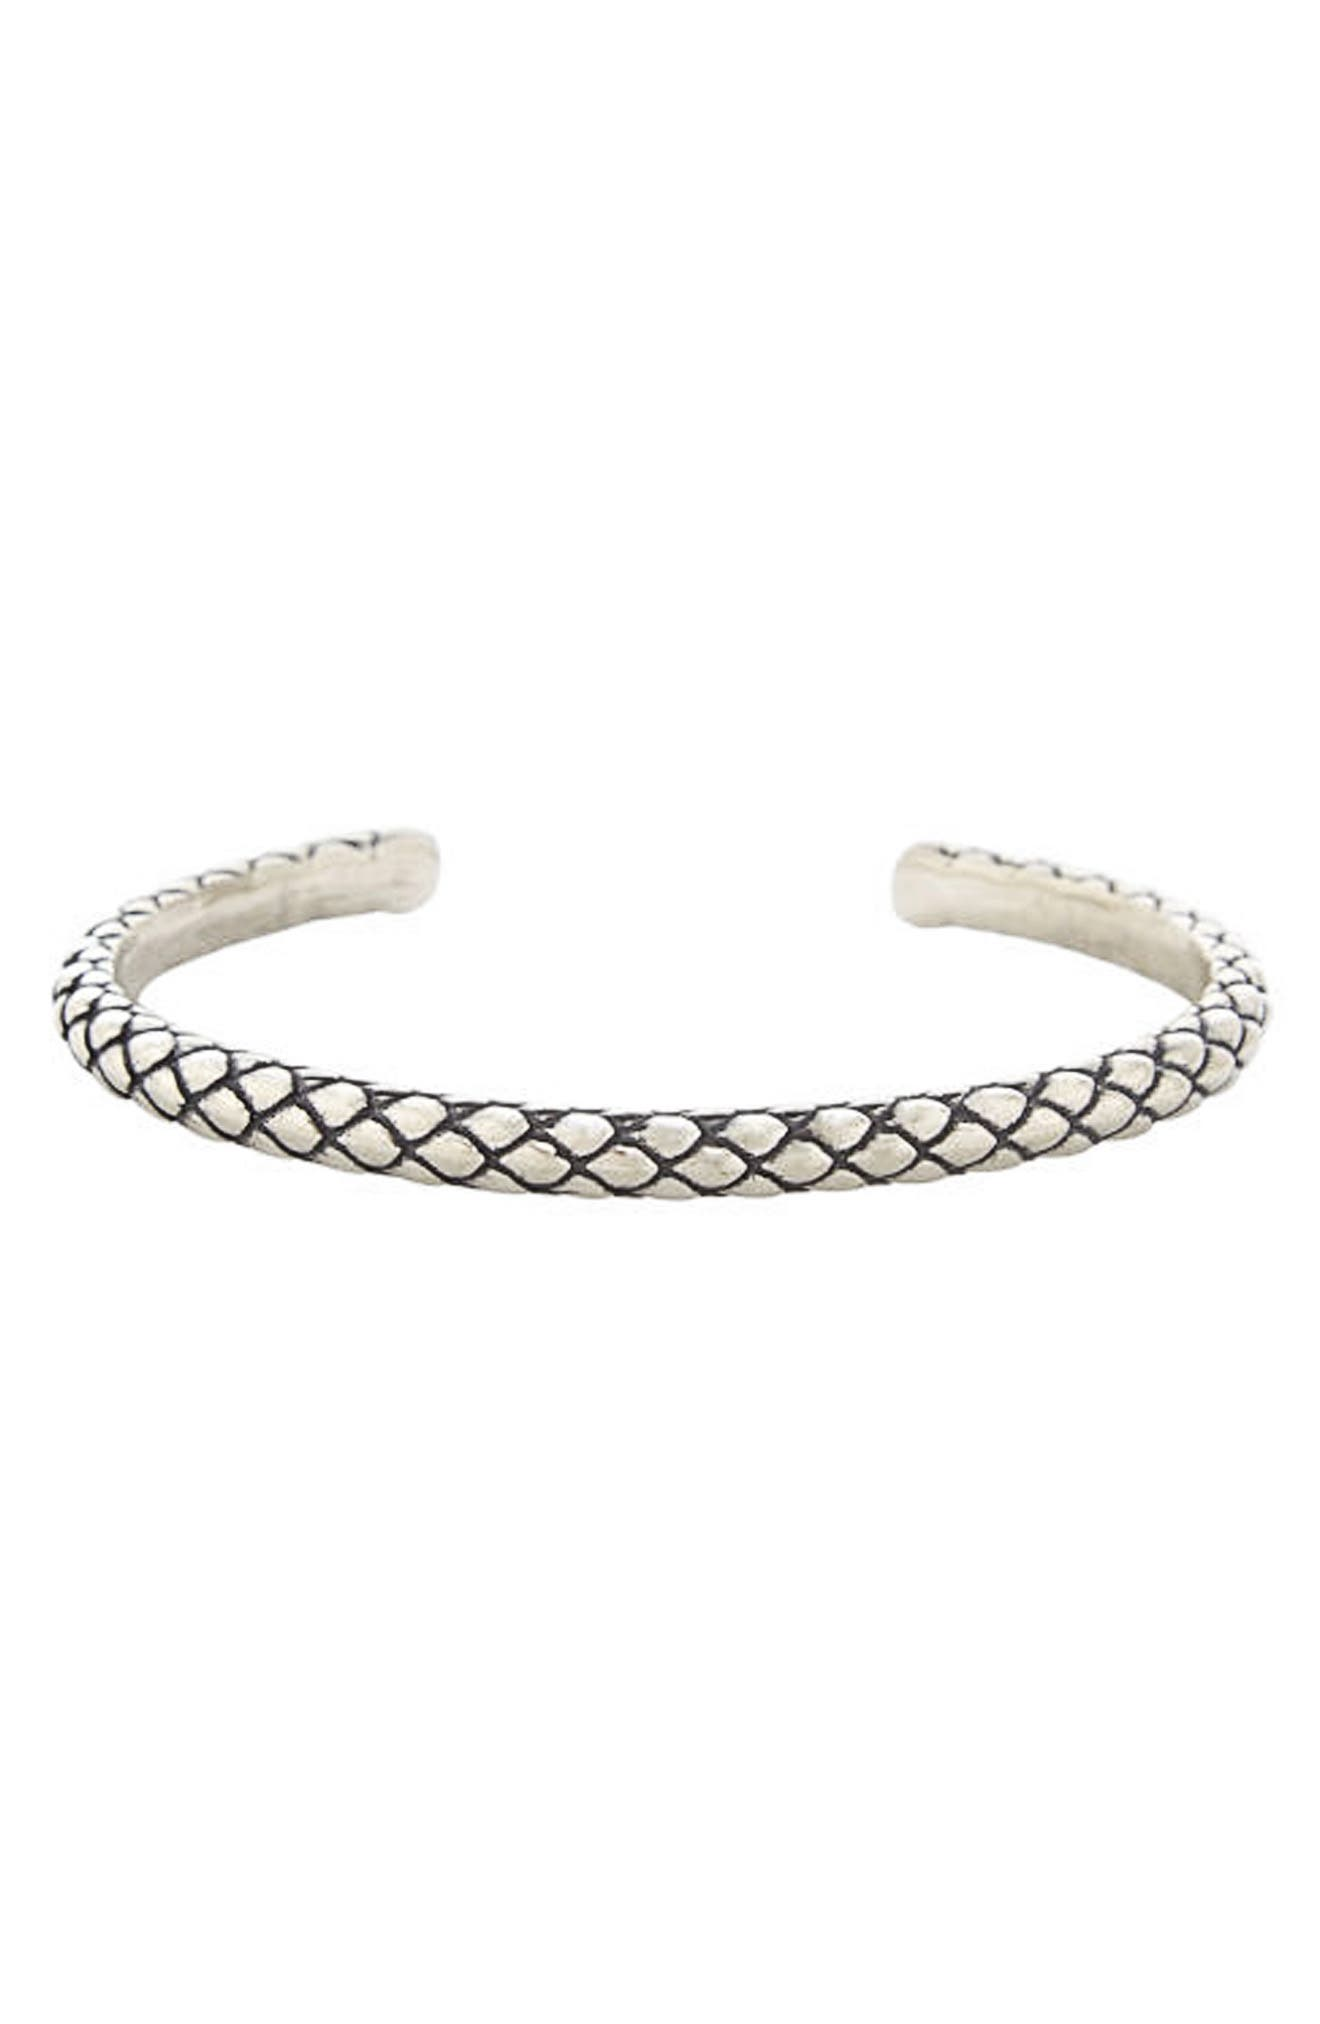 Stealth Cuff Bracelet